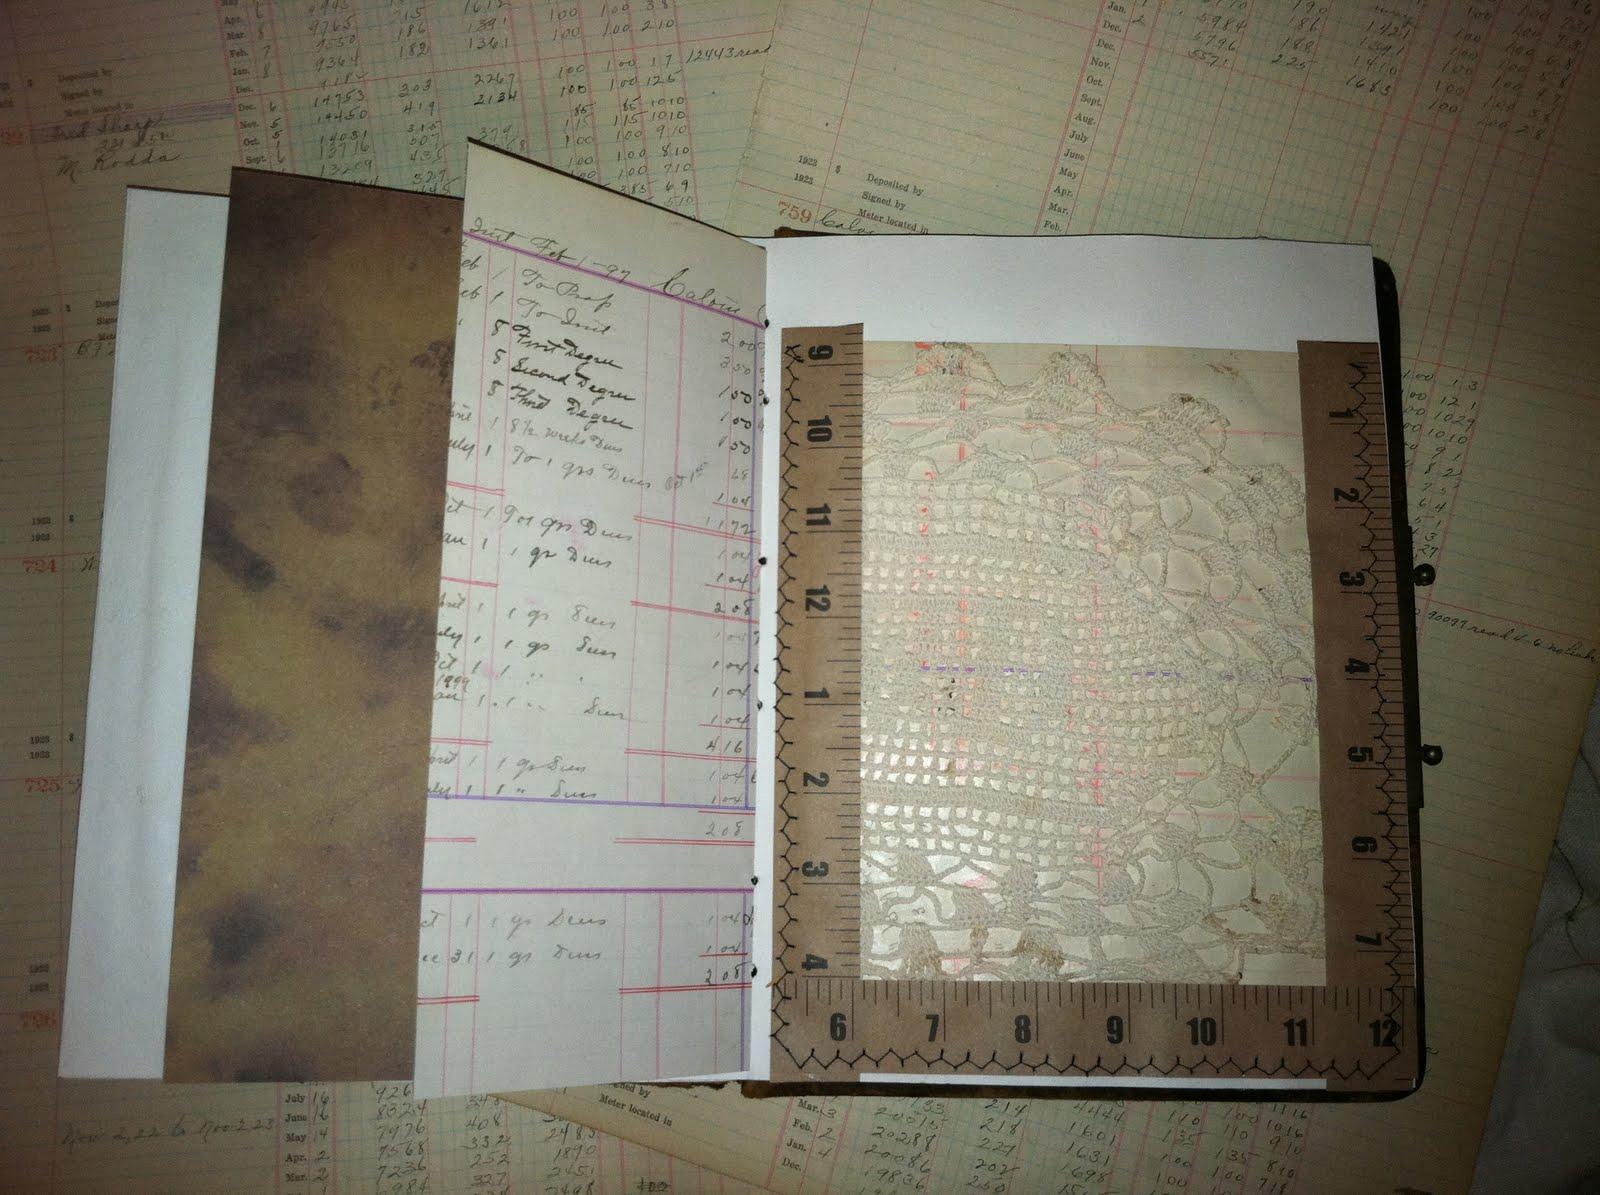 http://2.bp.blogspot.com/-PeFImVP10uc/TkFrMtKYNaI/AAAAAAAAA9M/NeOo3FH1-HE/s1600/Leather+Antique+Pao+Album+Journal+029.JPG